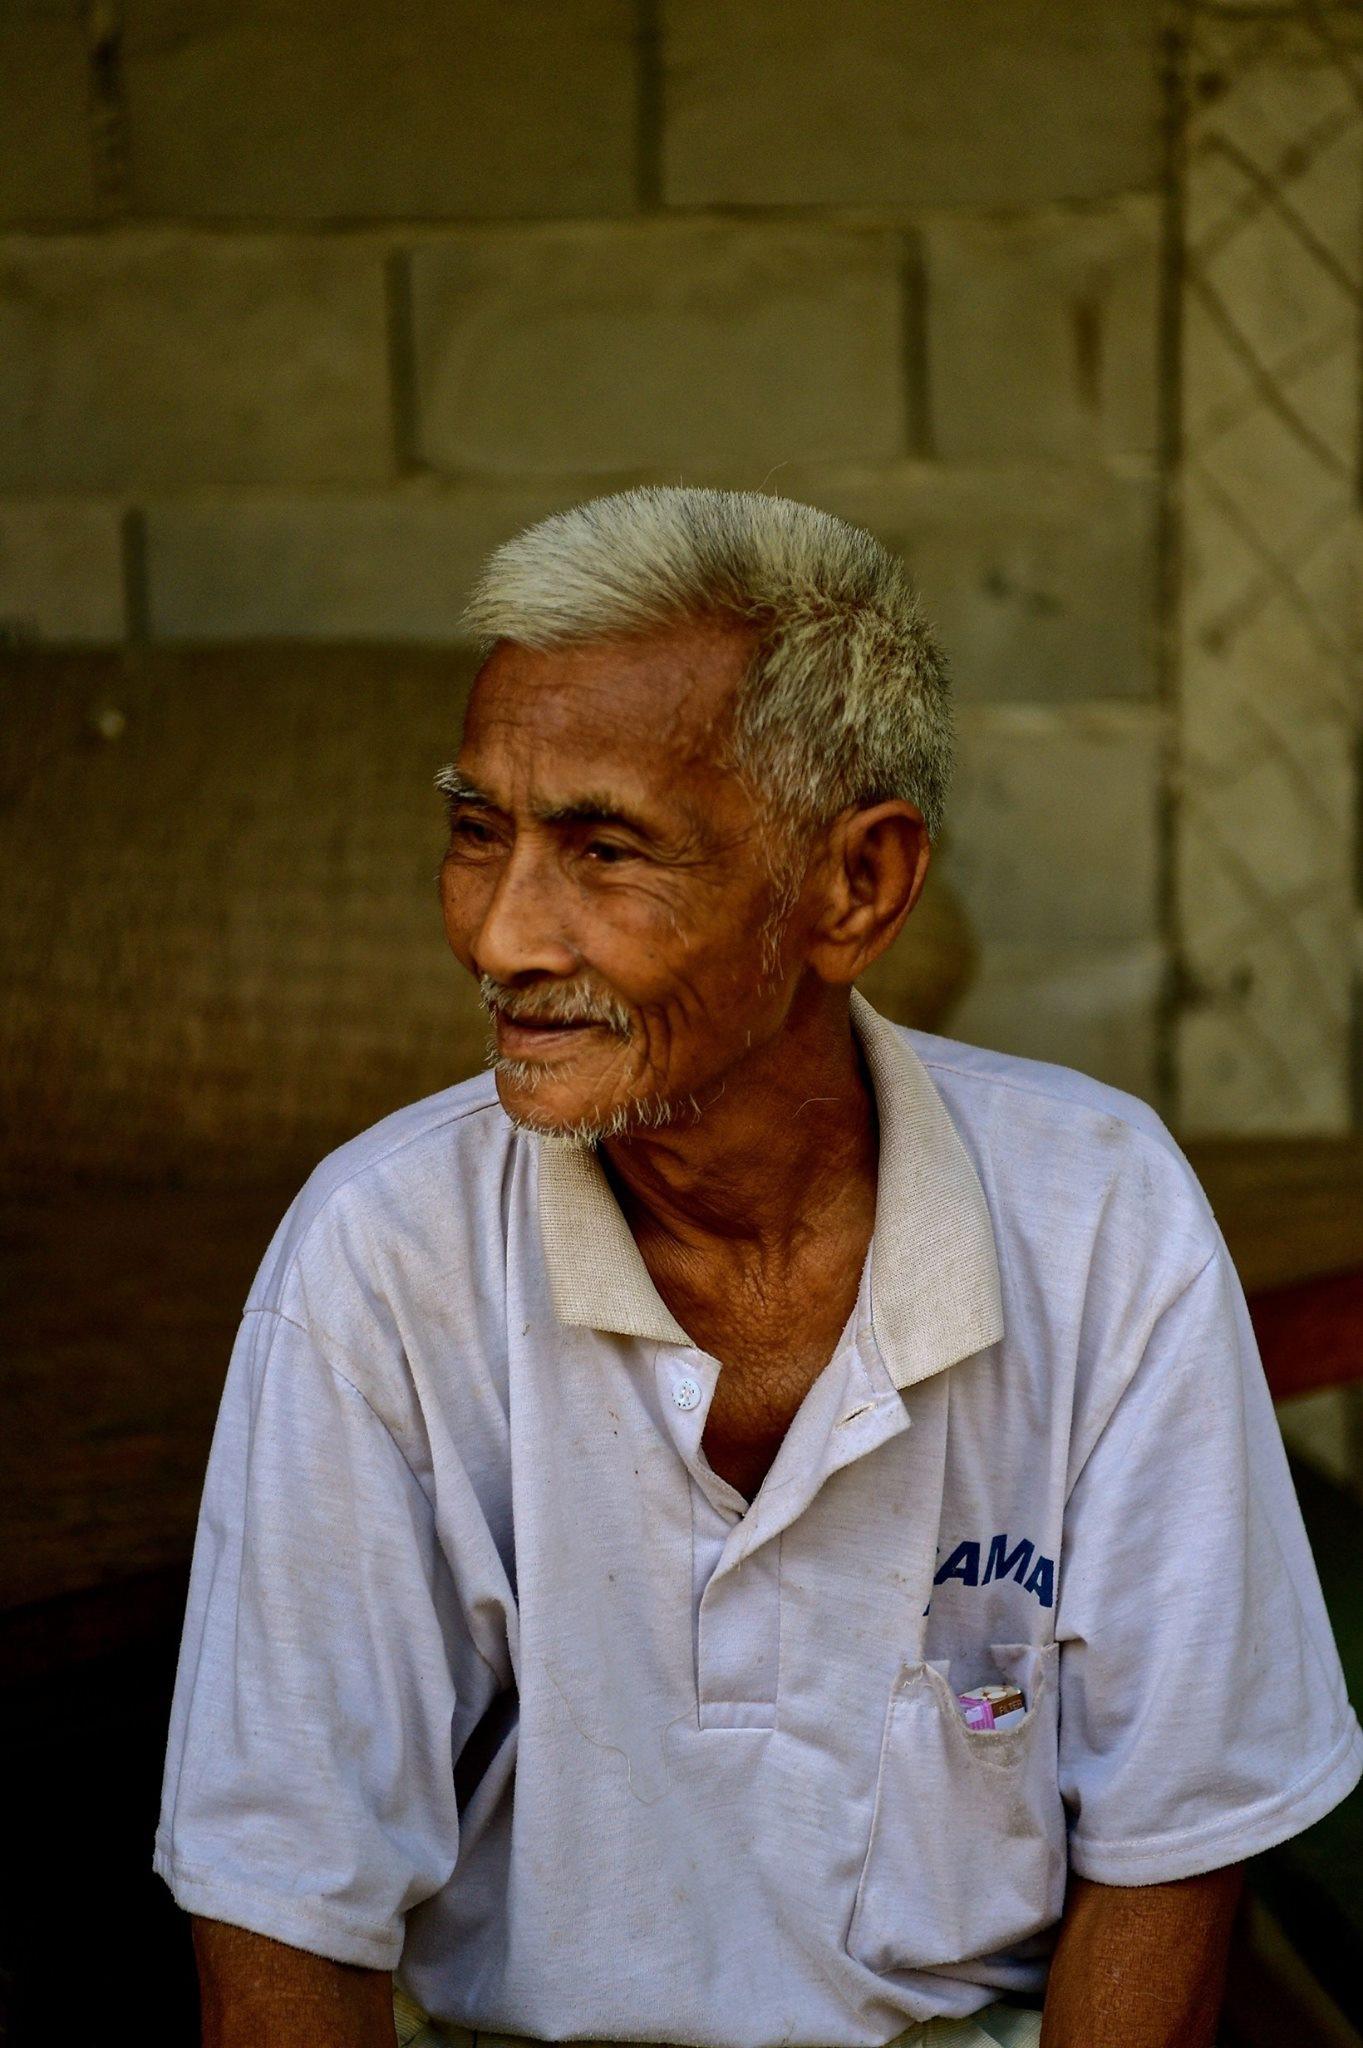 Laos - farmer 2018 by Robert Malin Young